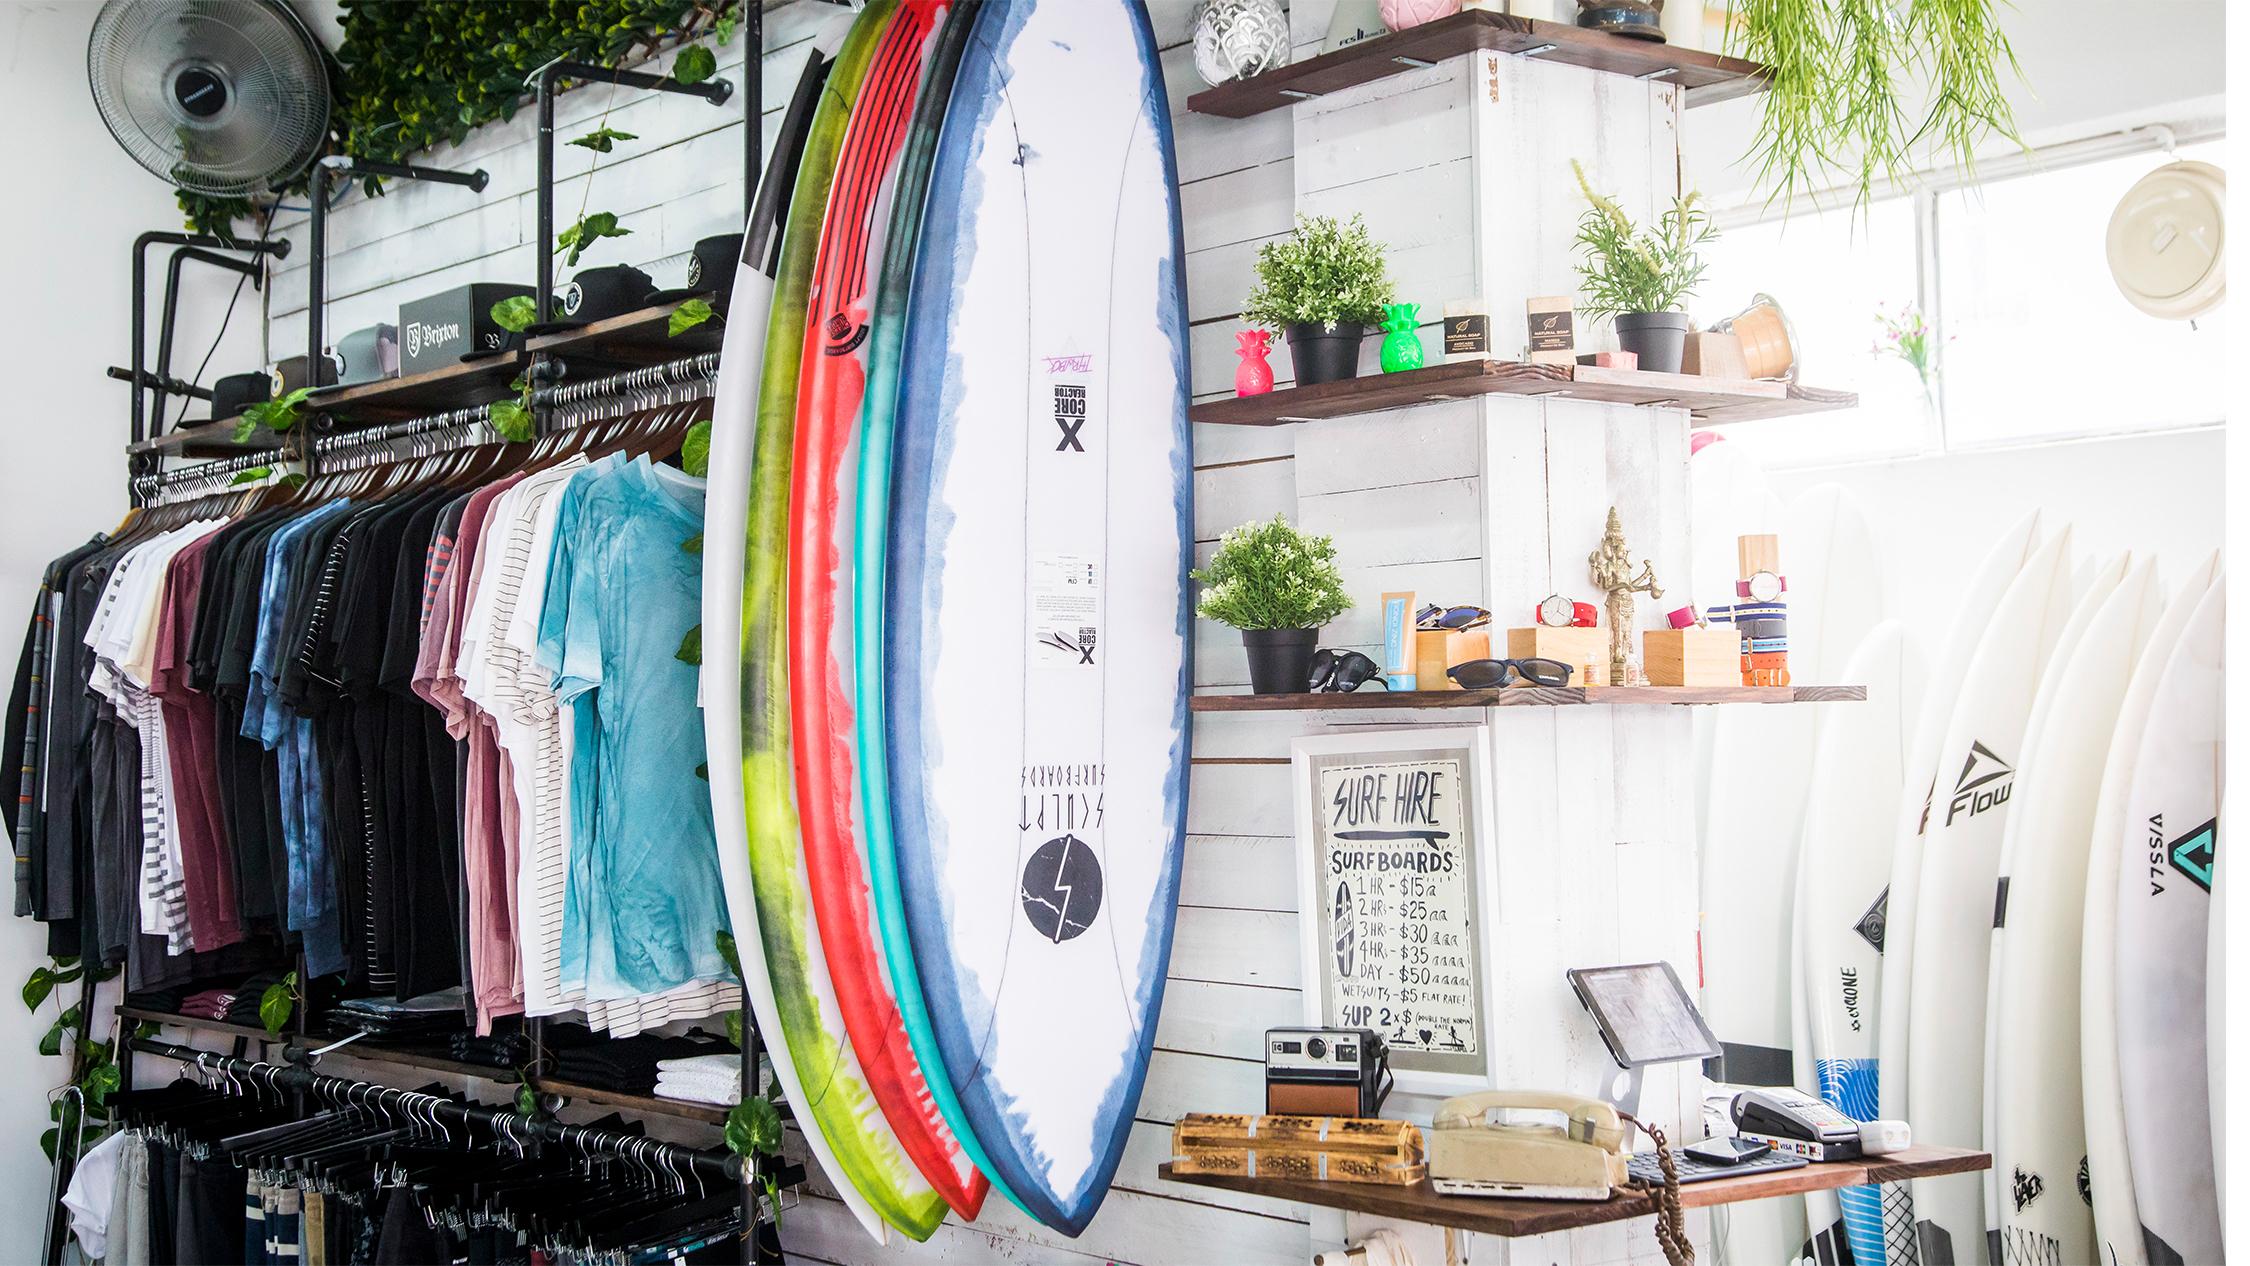 Vida Surf Store